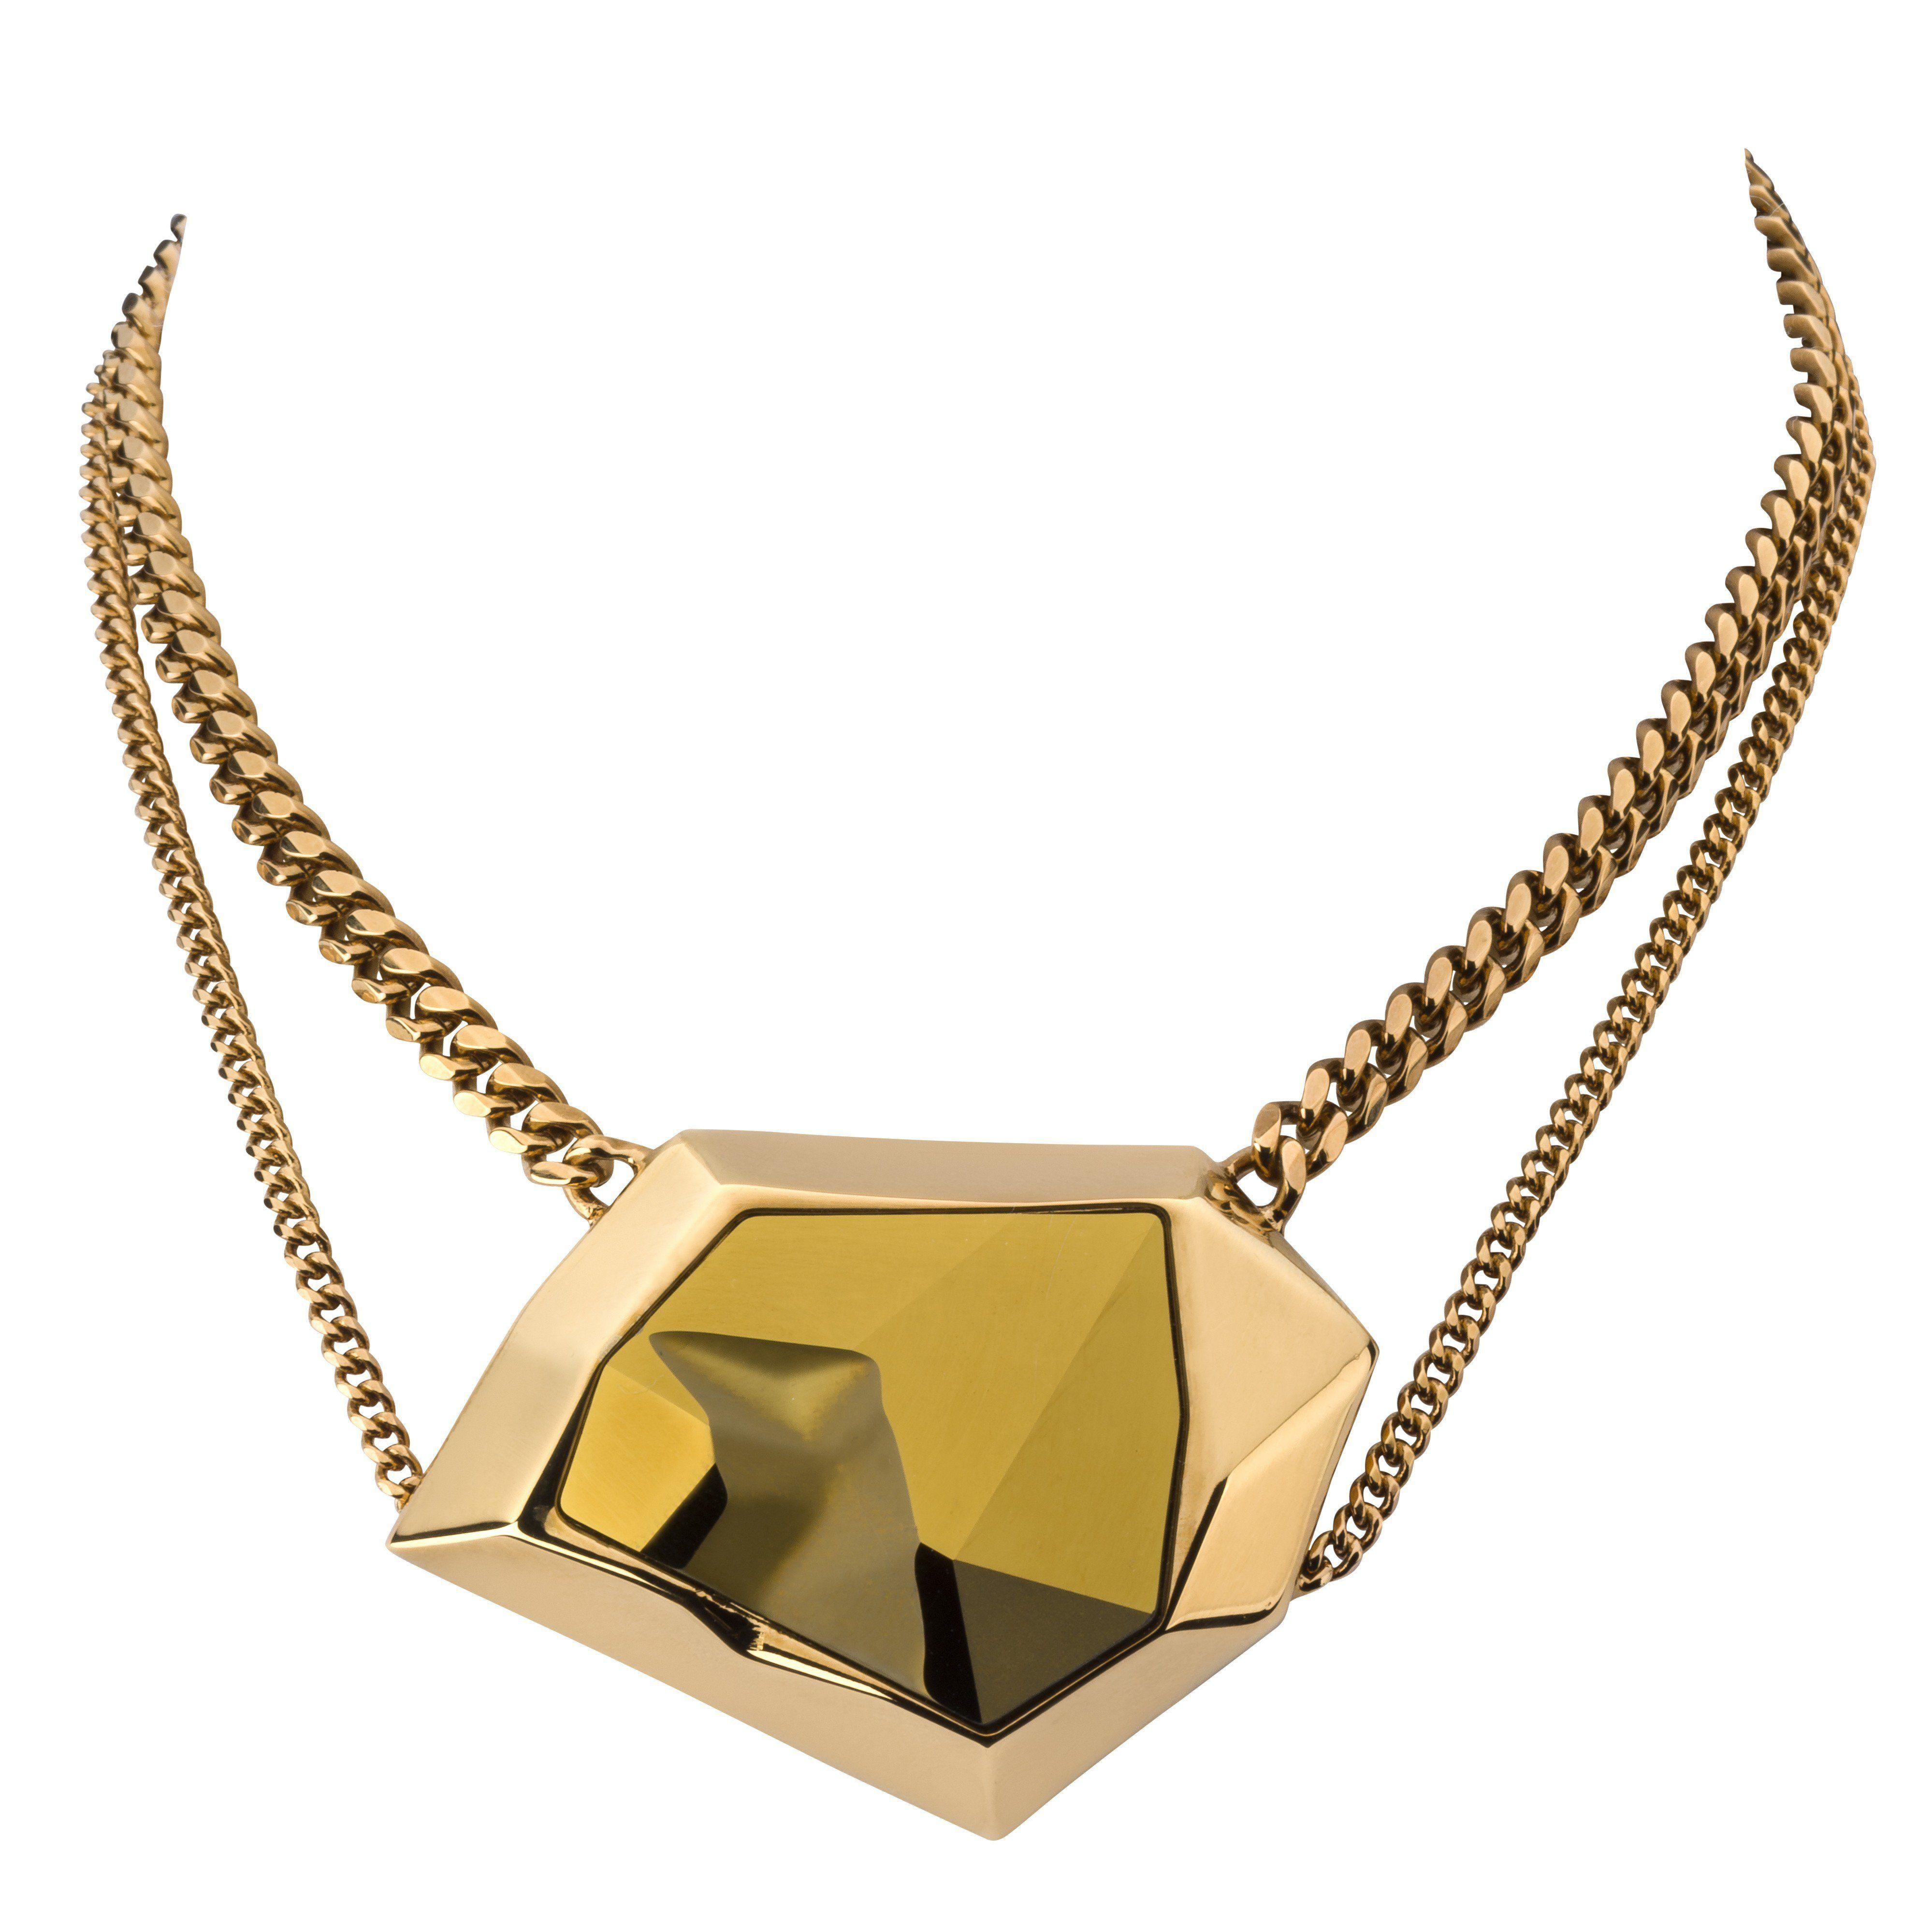 ATELIER SWAROVSKI - Reverse Pendant by Jean Paul Gaultier  statementnecklace 0c791b8544